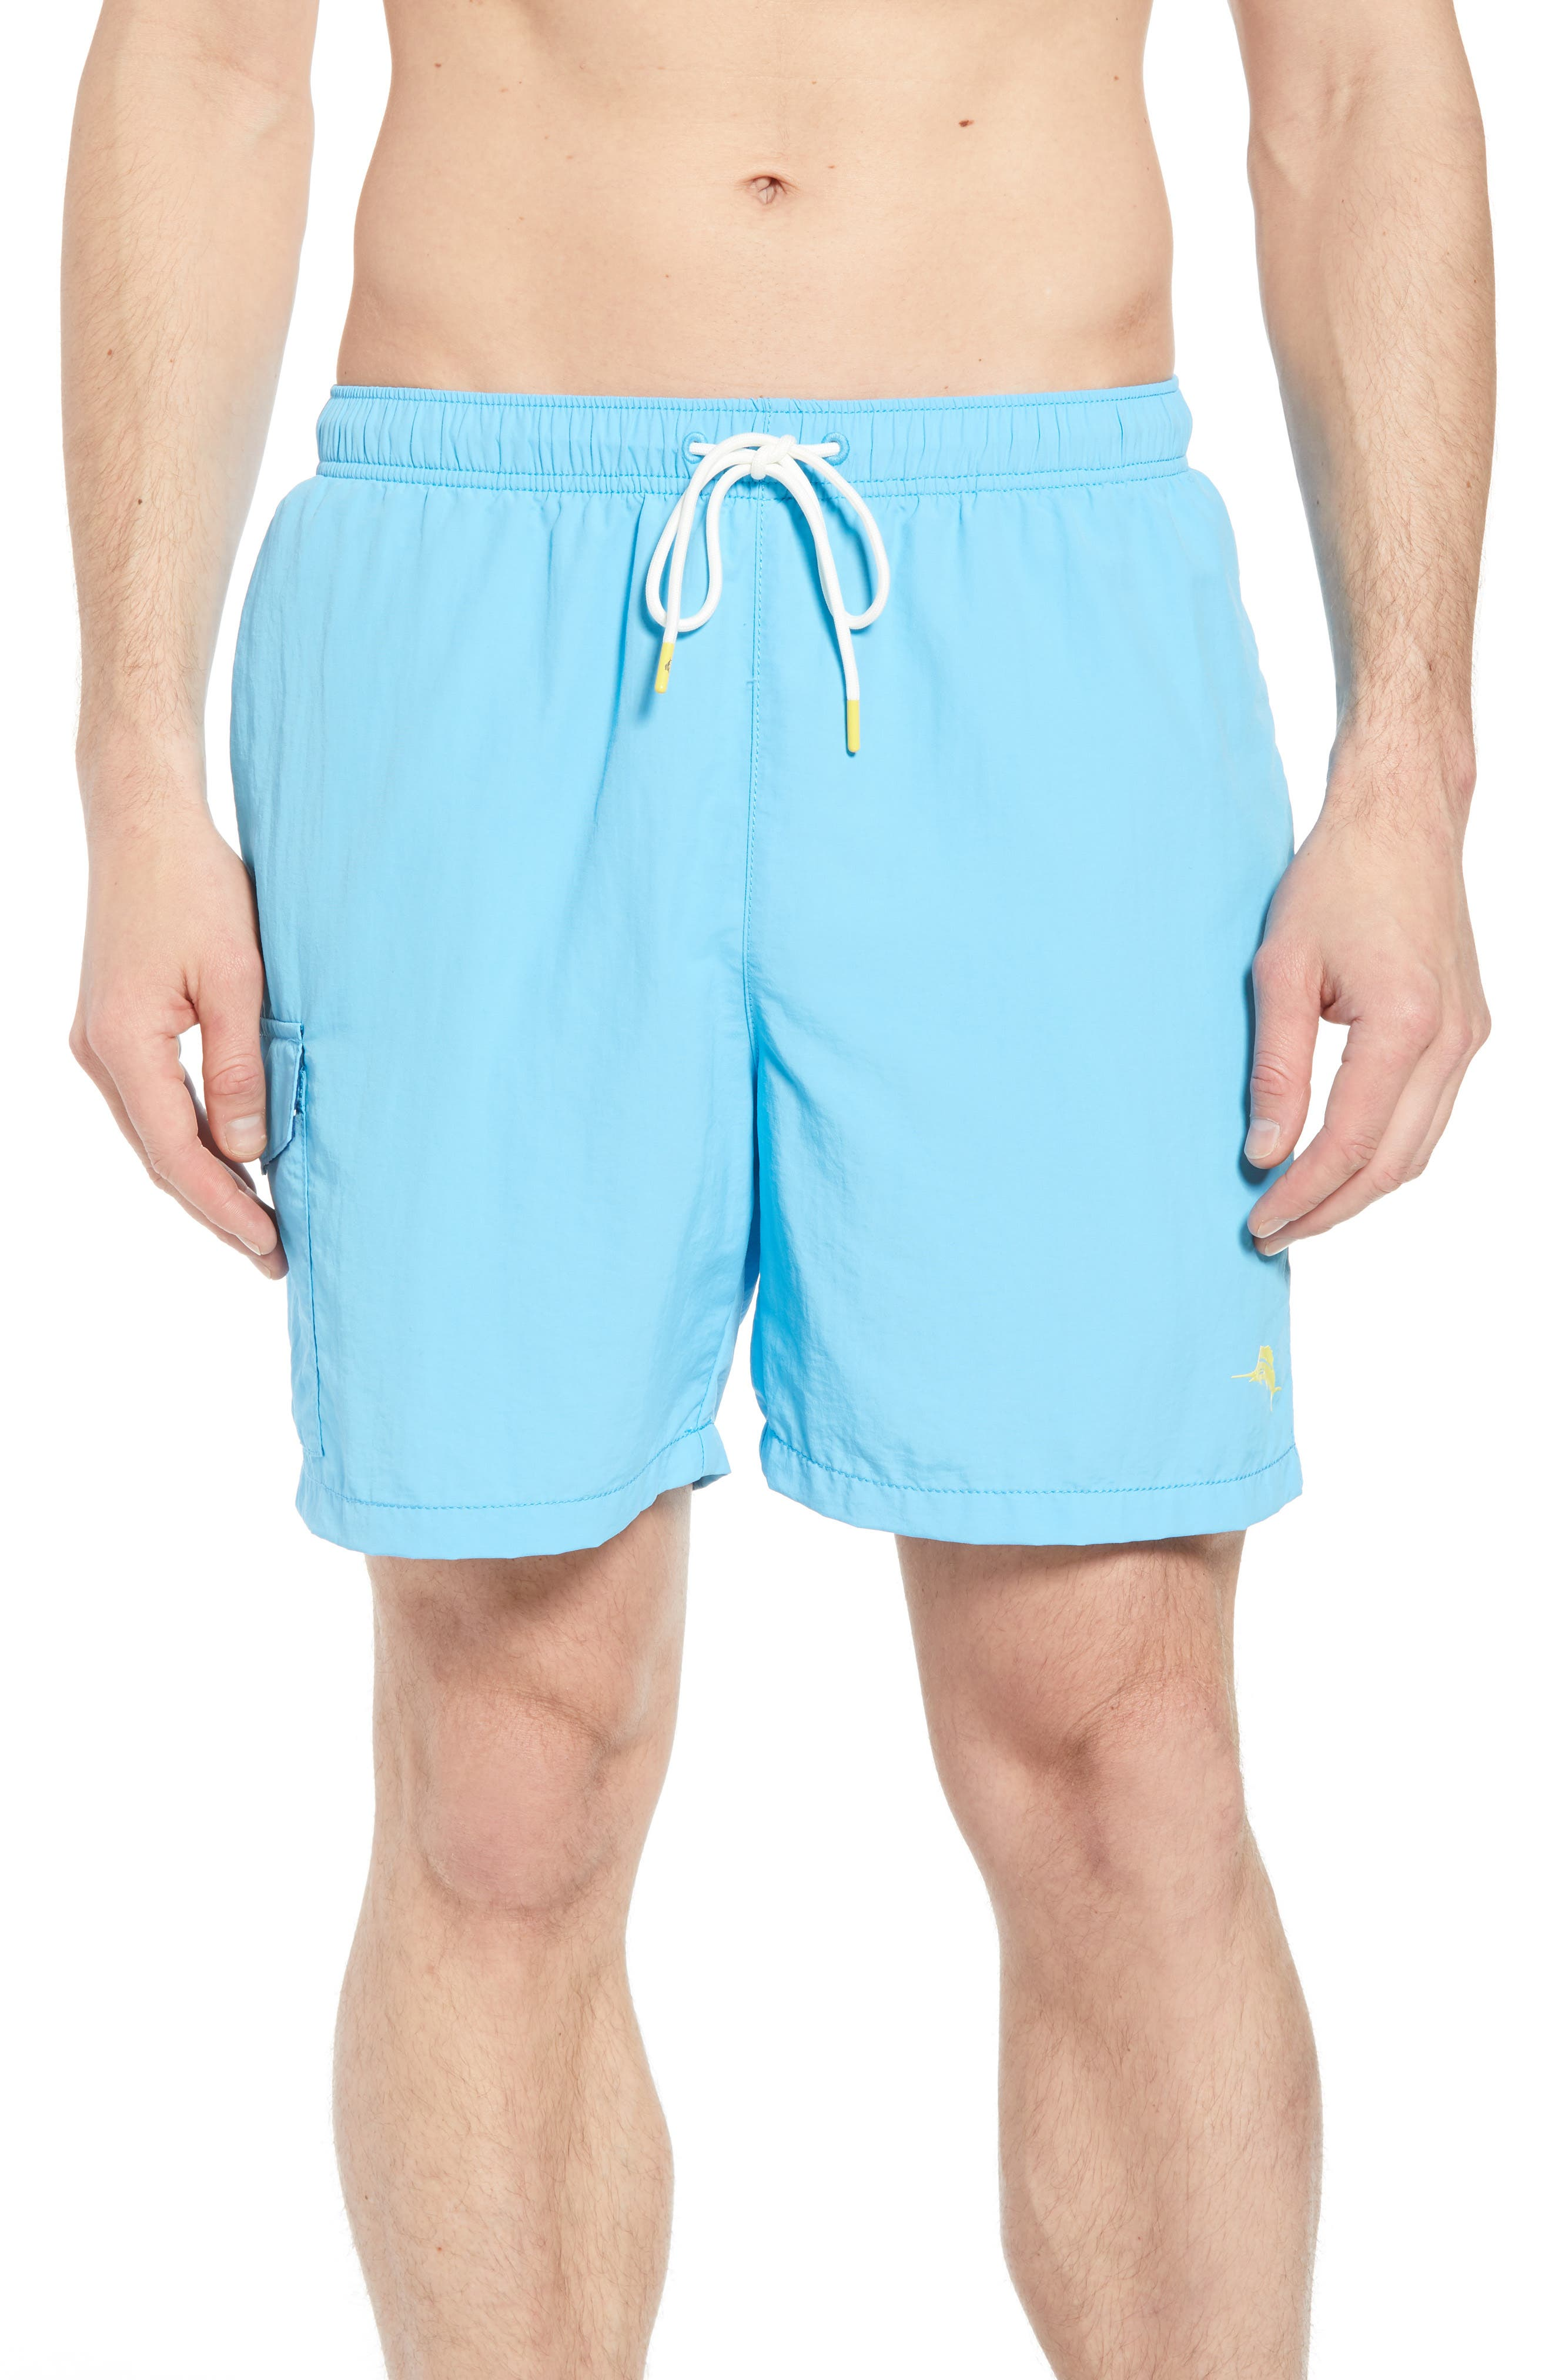 Naples Coast Swim Trunks,                         Main,                         color, Breeze Blue